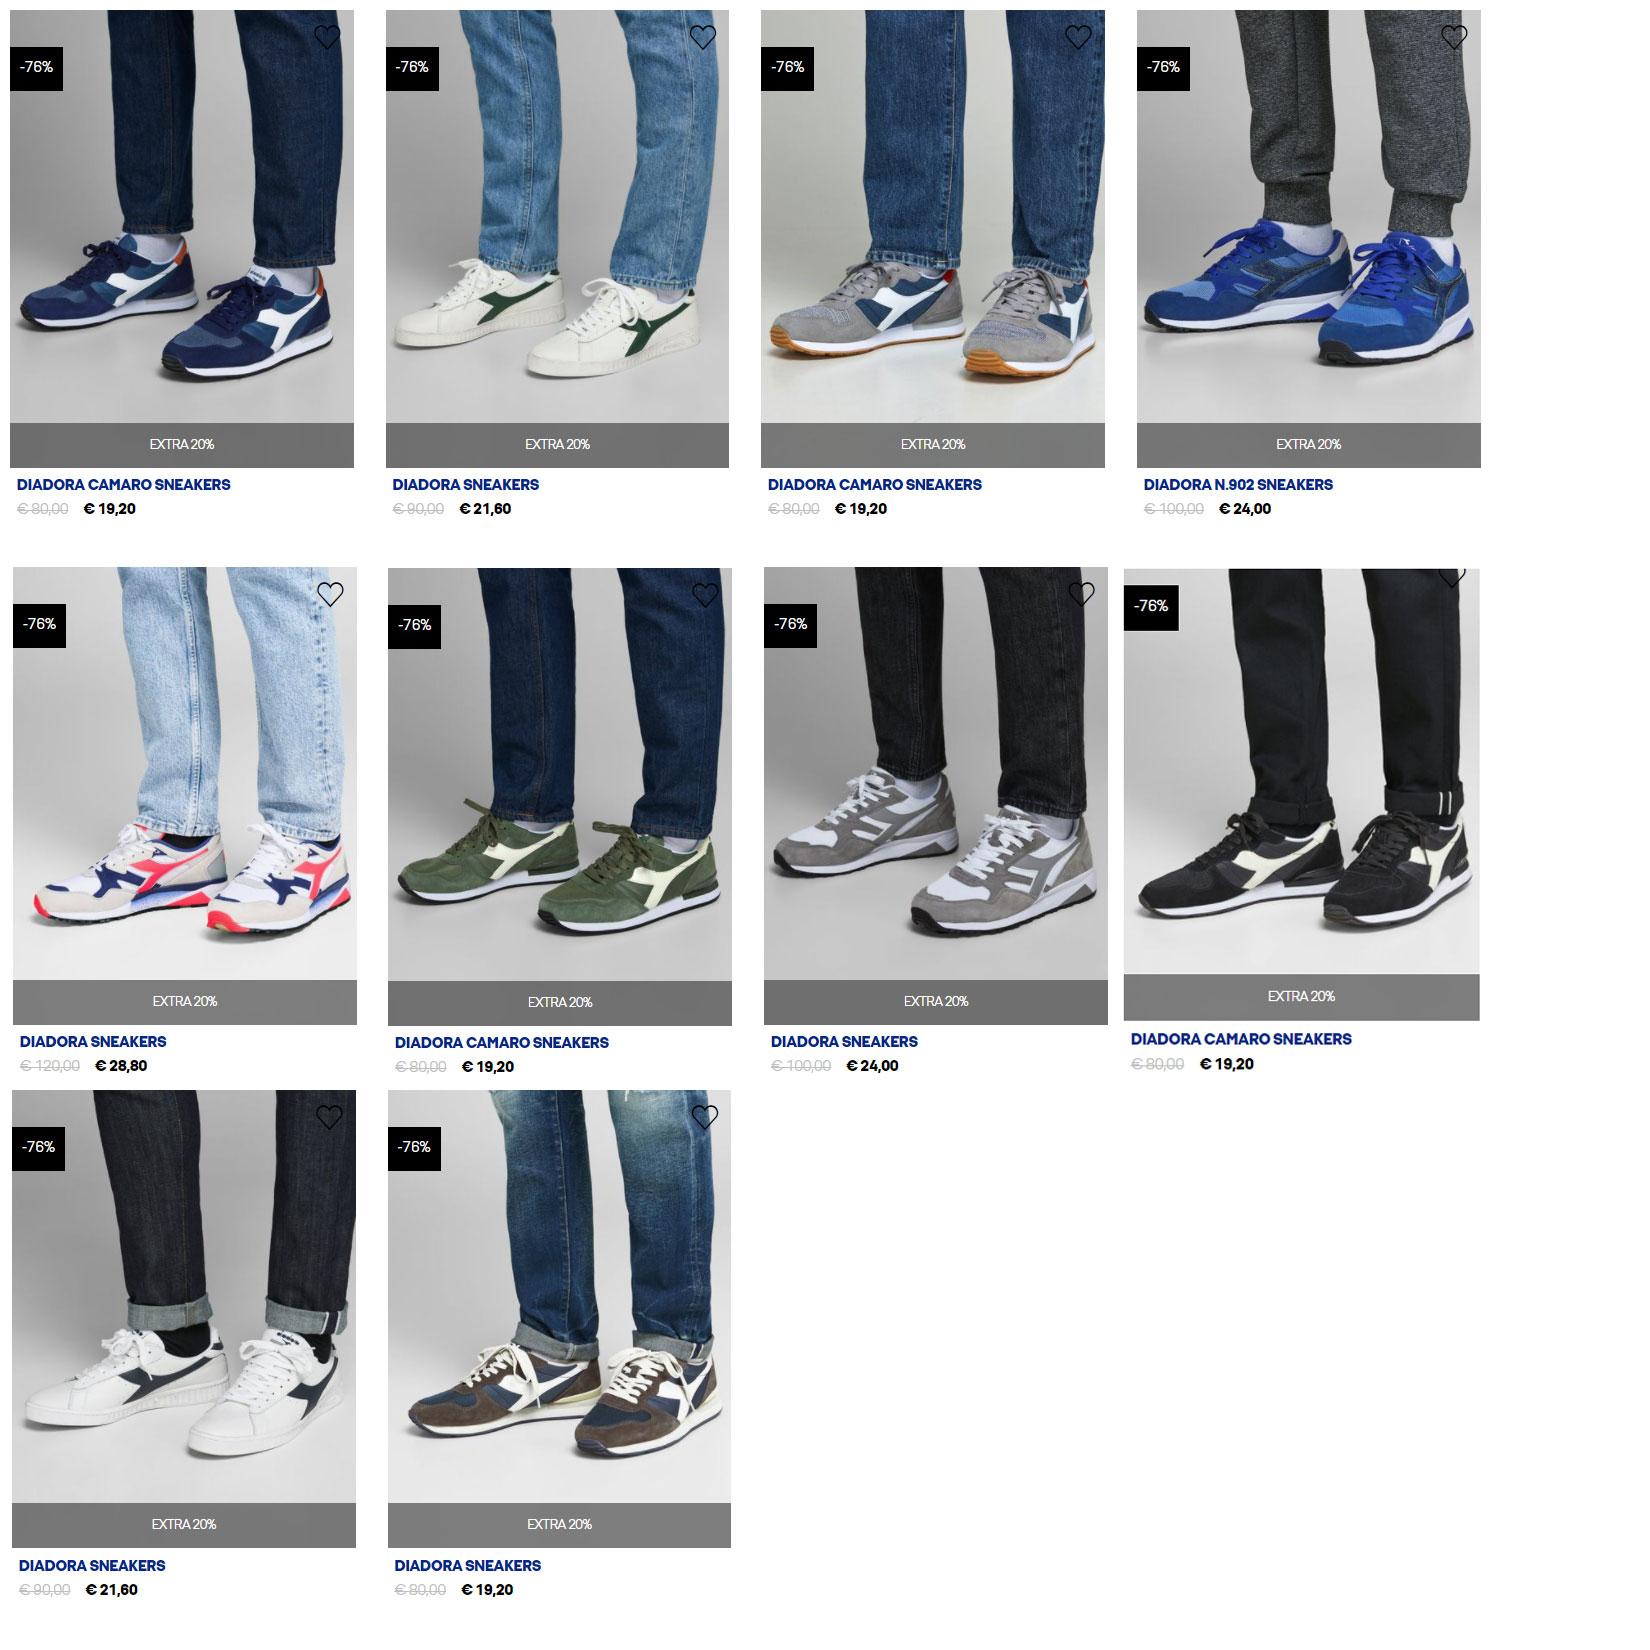 Diadora sneakers -70% + 20% EXTRA @ Jack & Jones